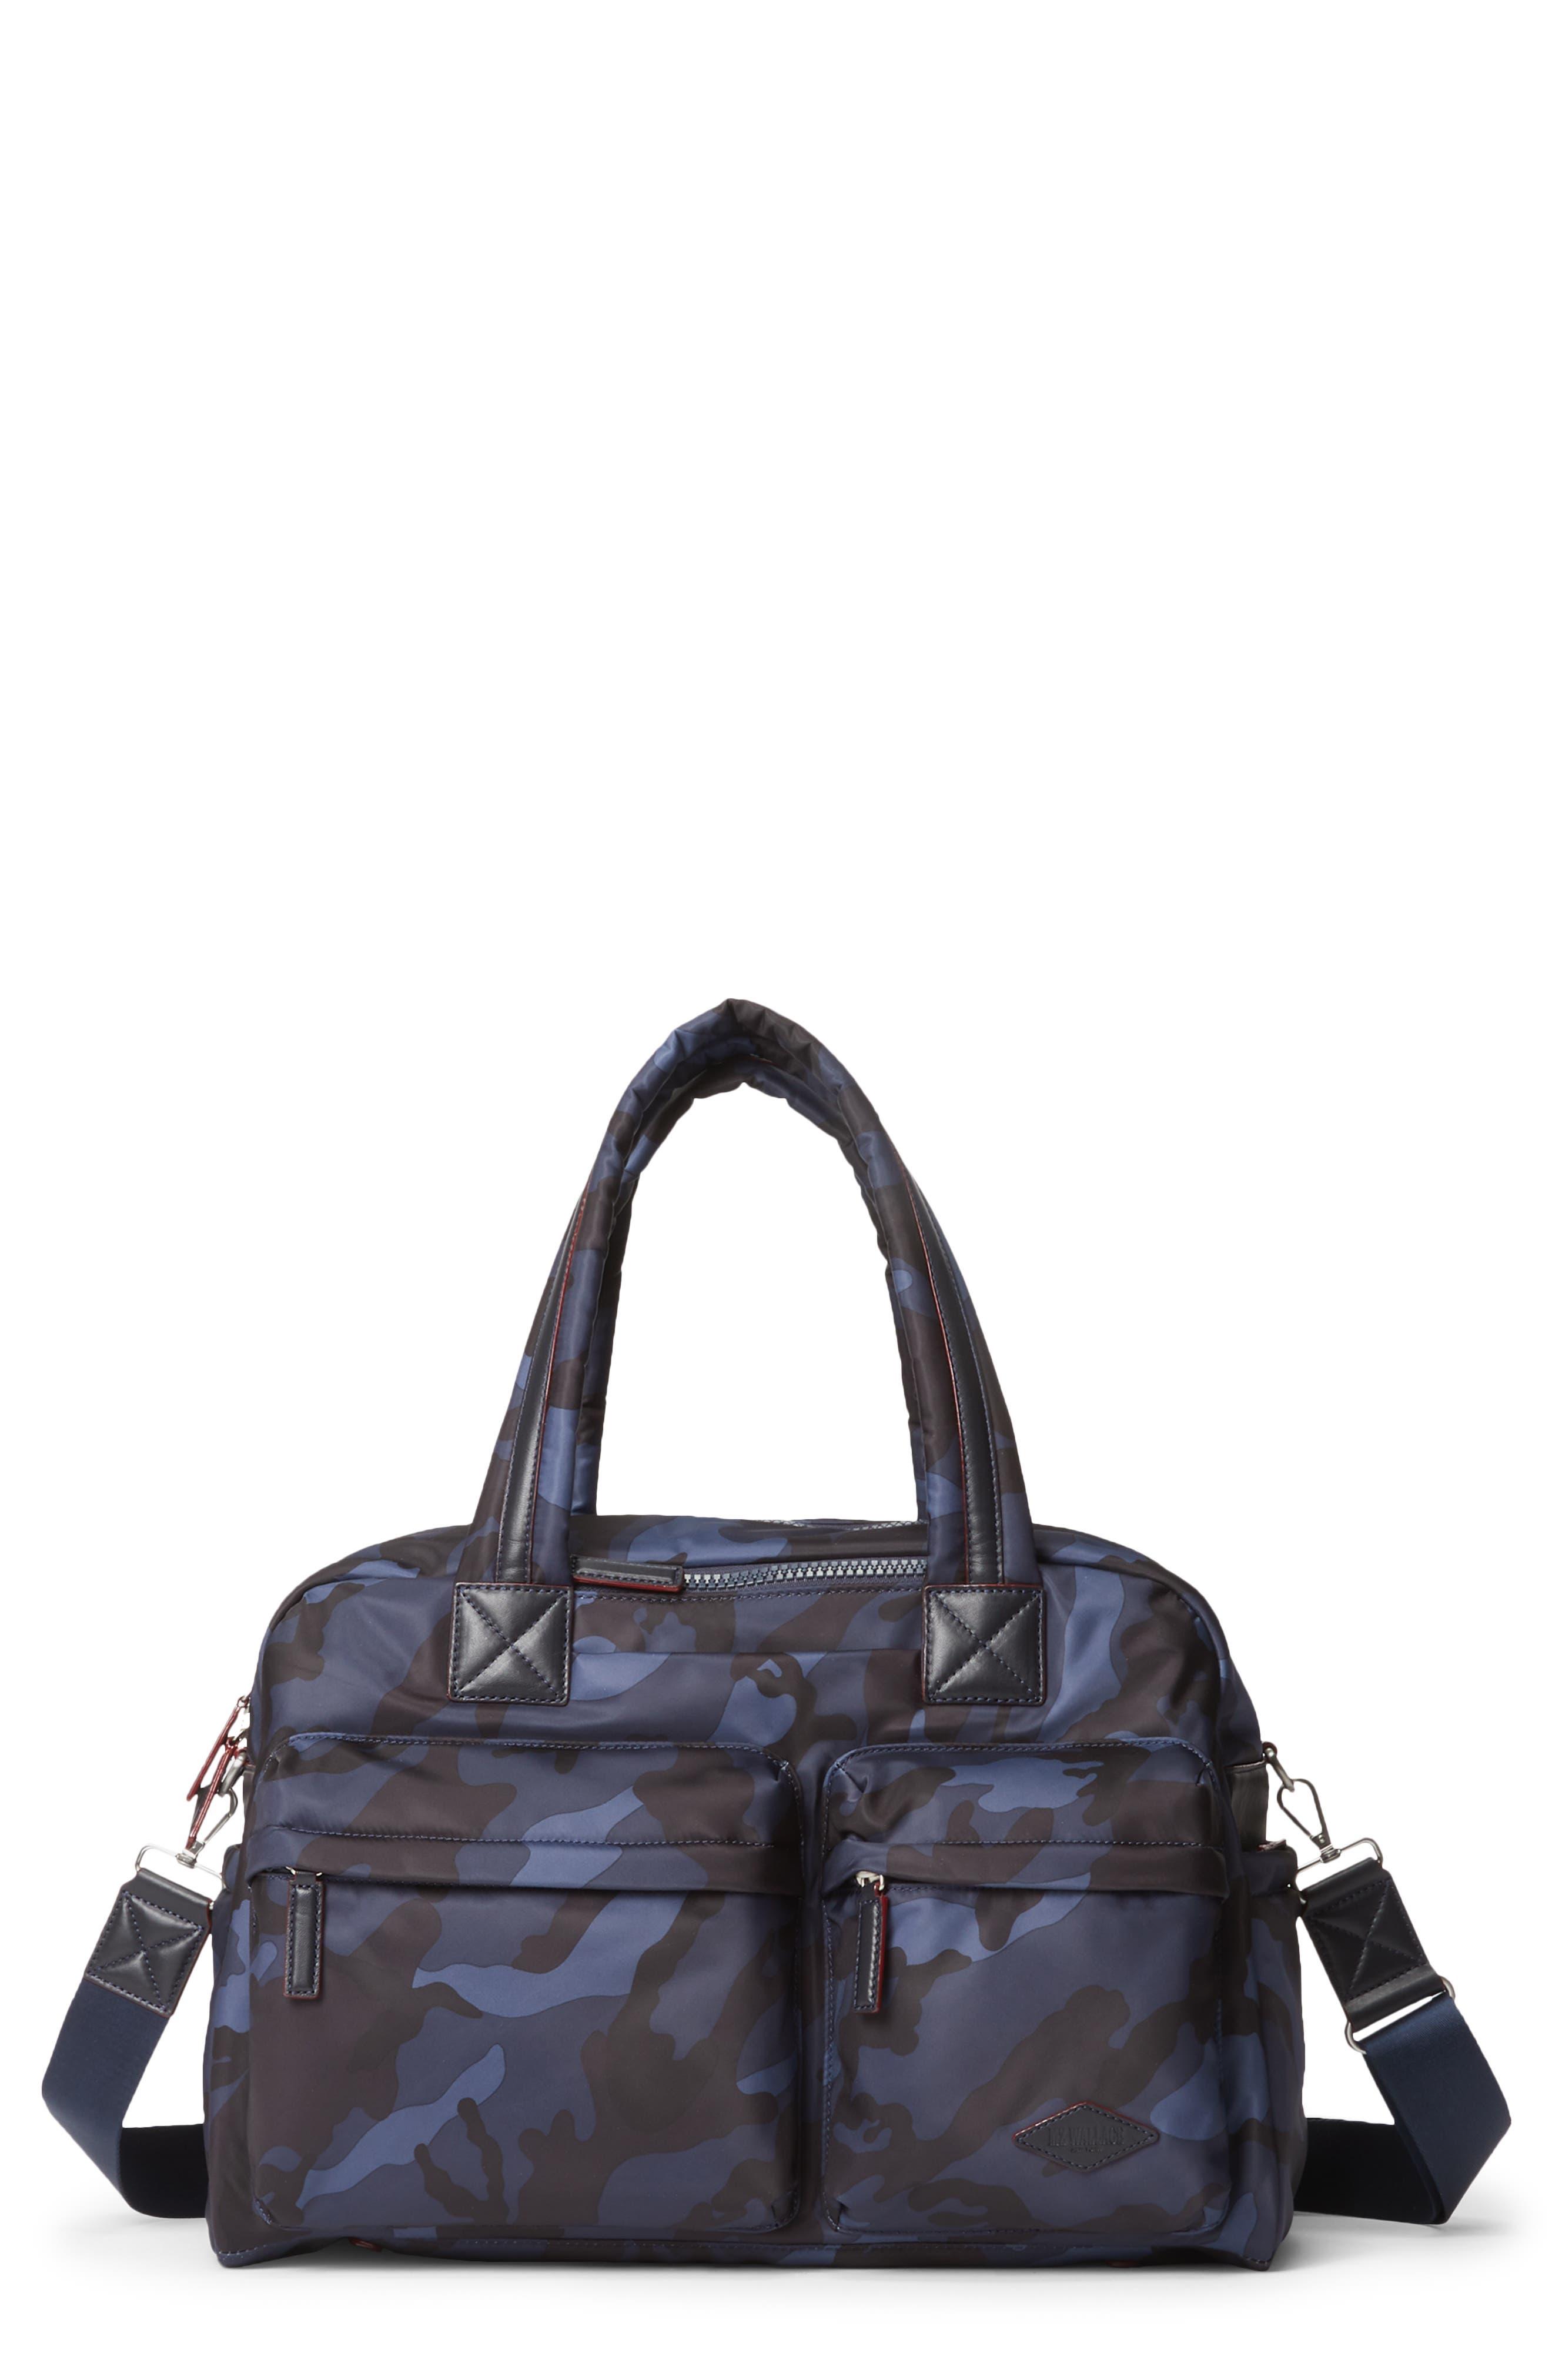 Mz Wallace Bleecker Nylon Duffle Bag - Blue